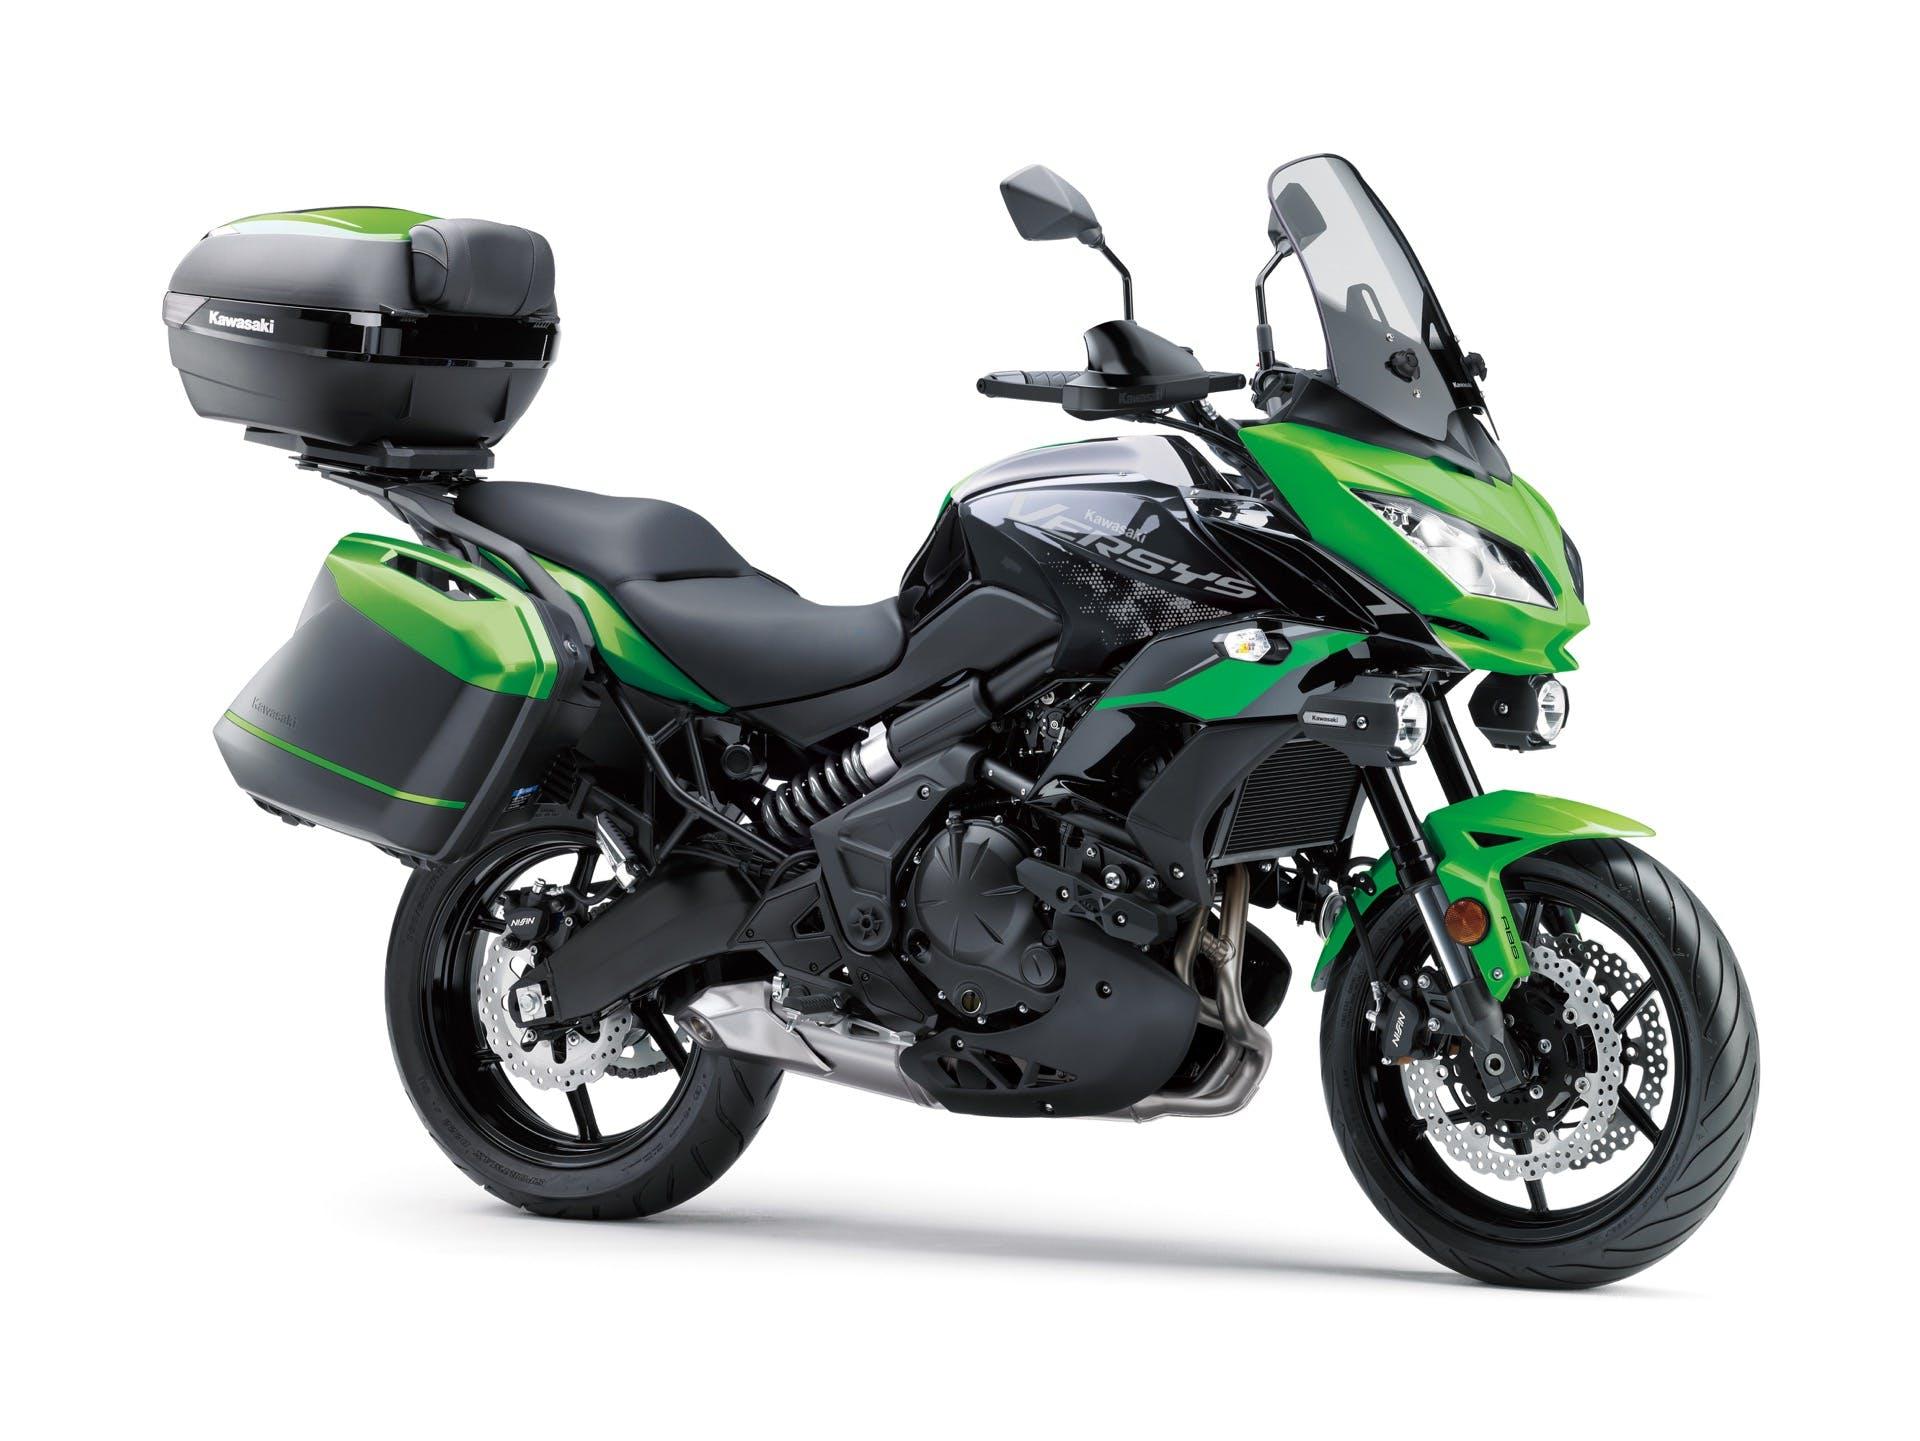 Kawasaki Versys 650 2021 verde con borse e bauletto